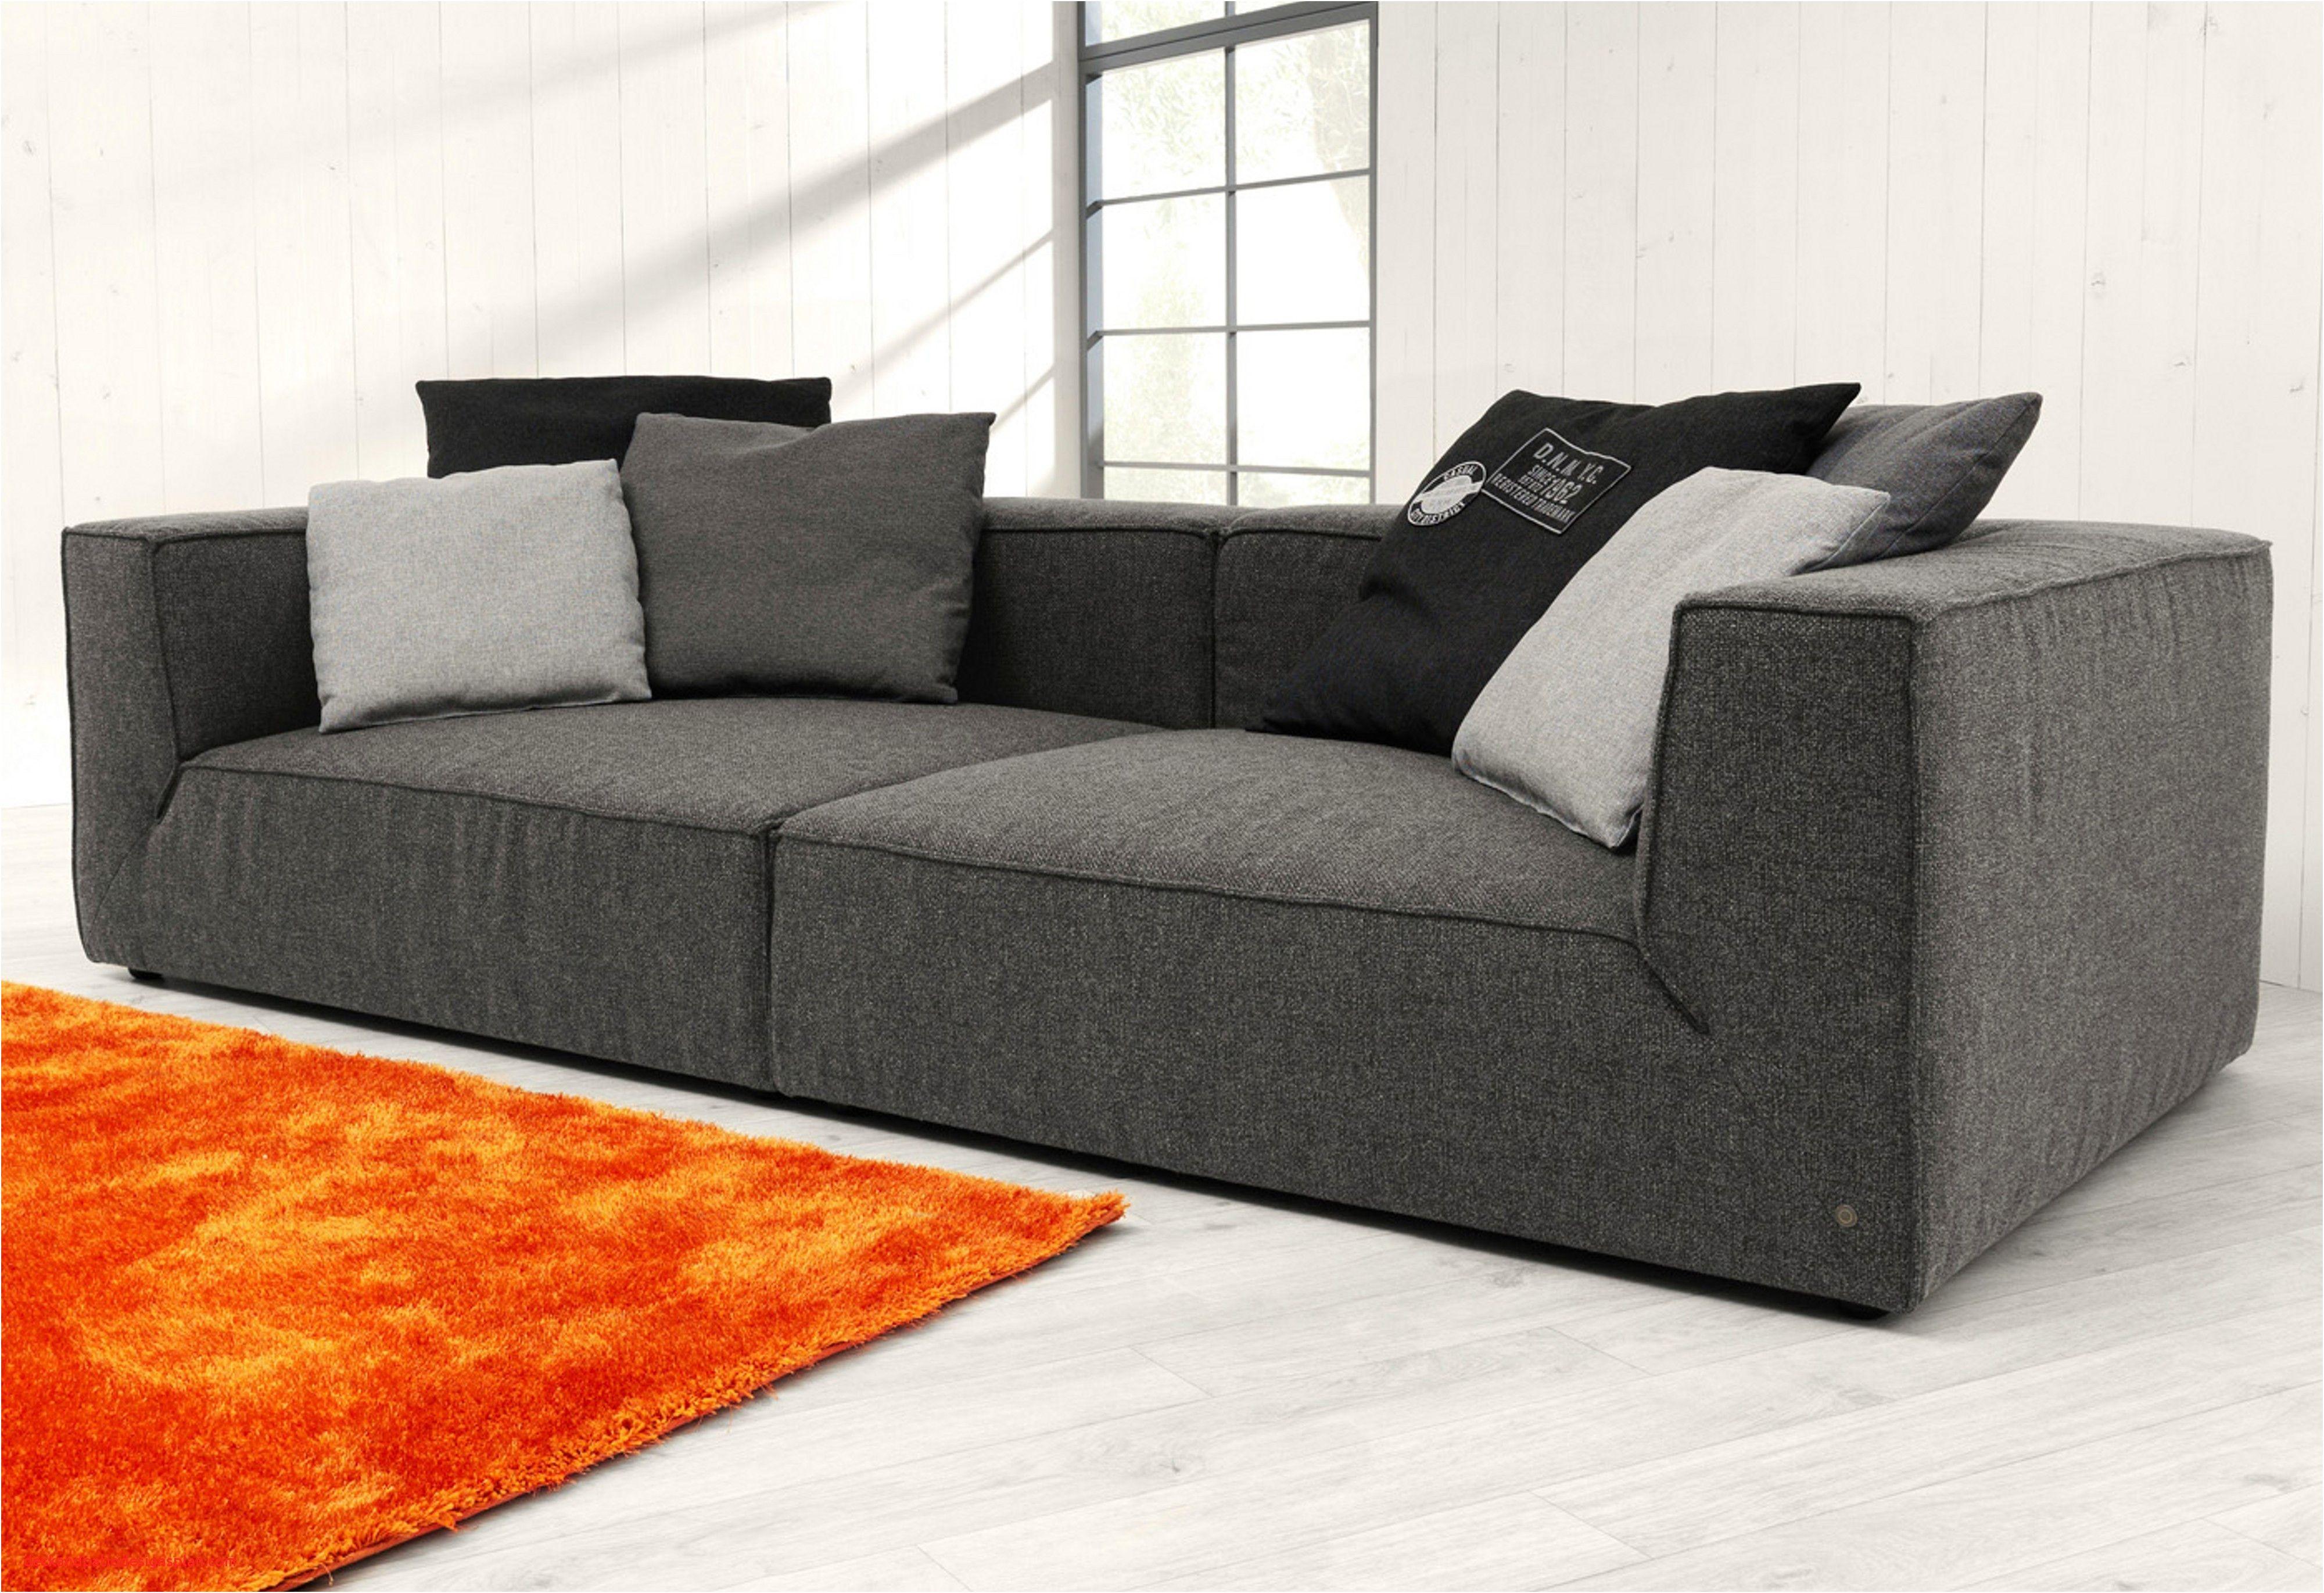 Praktisch 2 Sitzer Sofa Poco Check More At Https Tridentbeauties Org 2 Sitzer Sofa Poco 2 25406